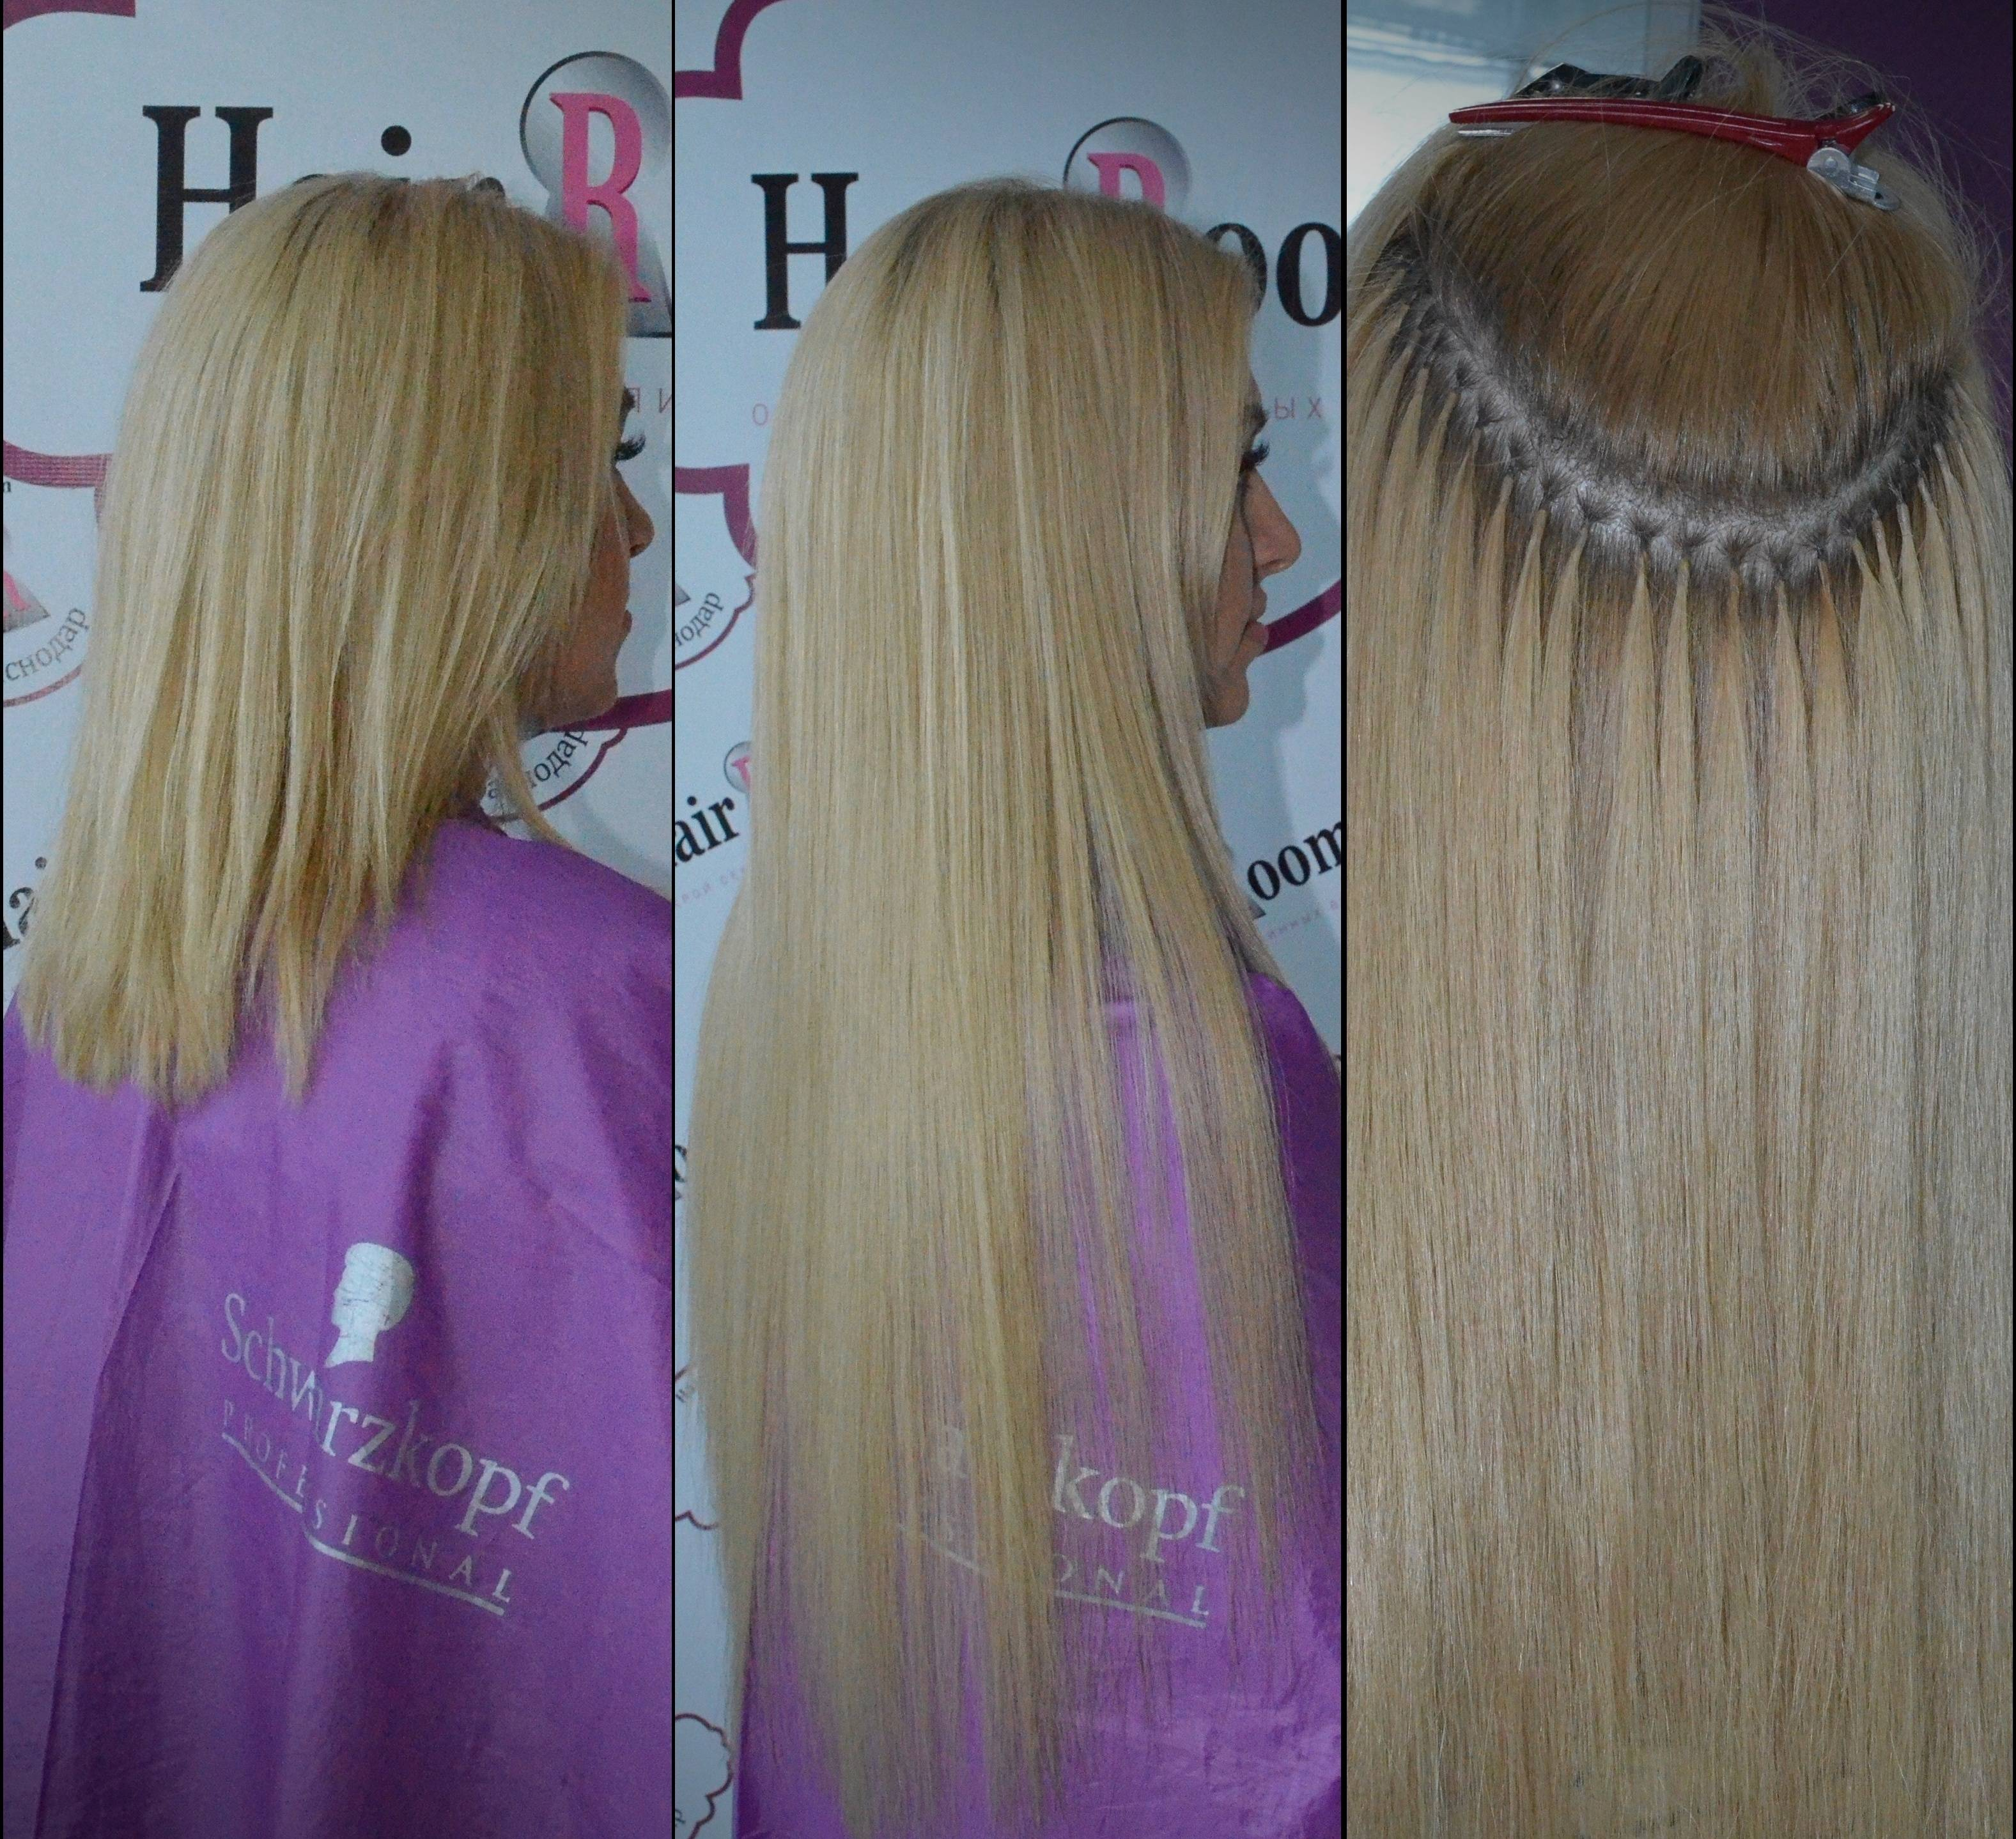 Японская технология наращивания волос на кольцах — ring star